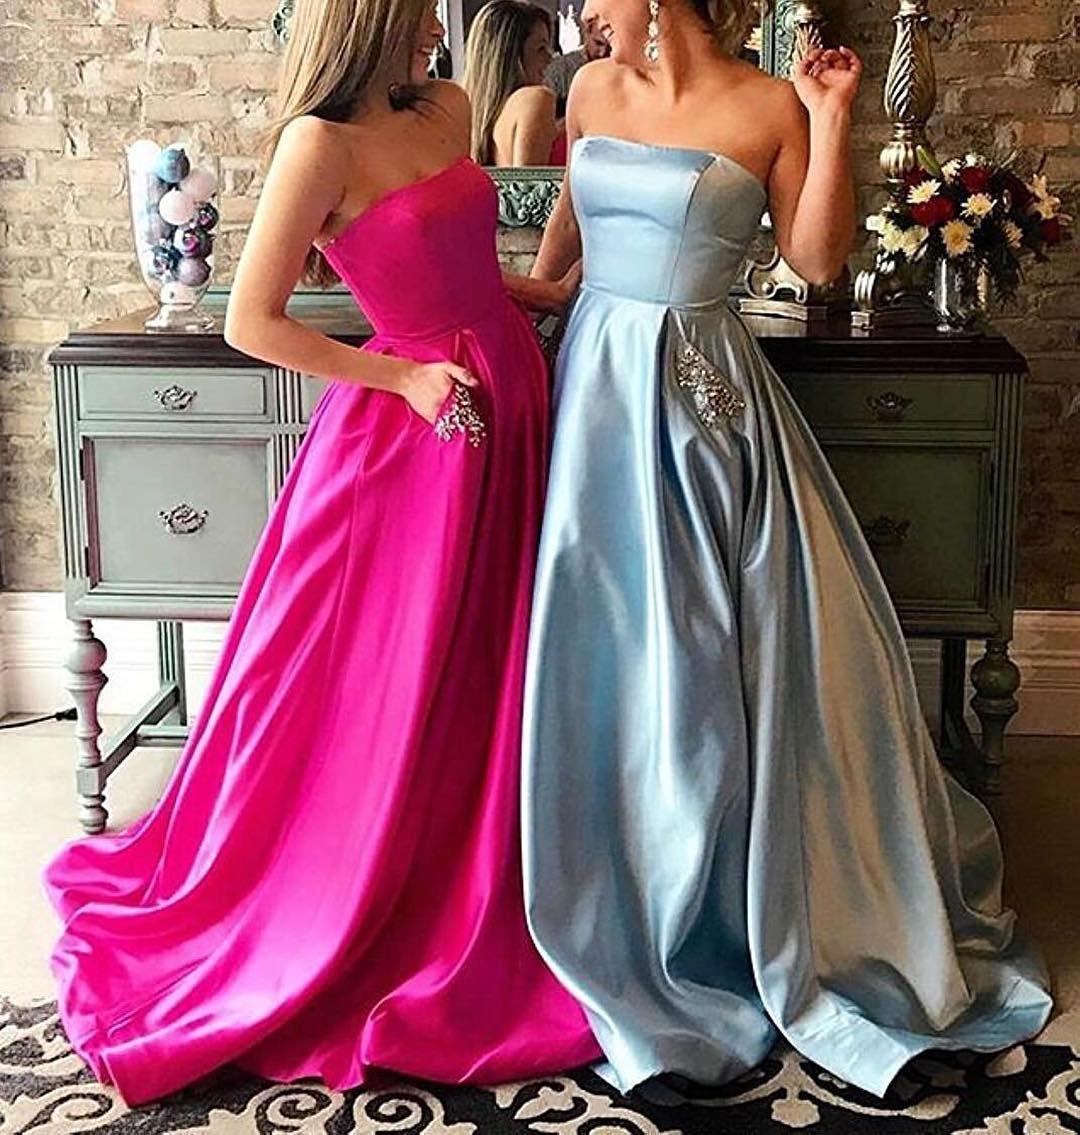 Marsendress 在 instagram 上发布ucbeaded strapless prom dresses